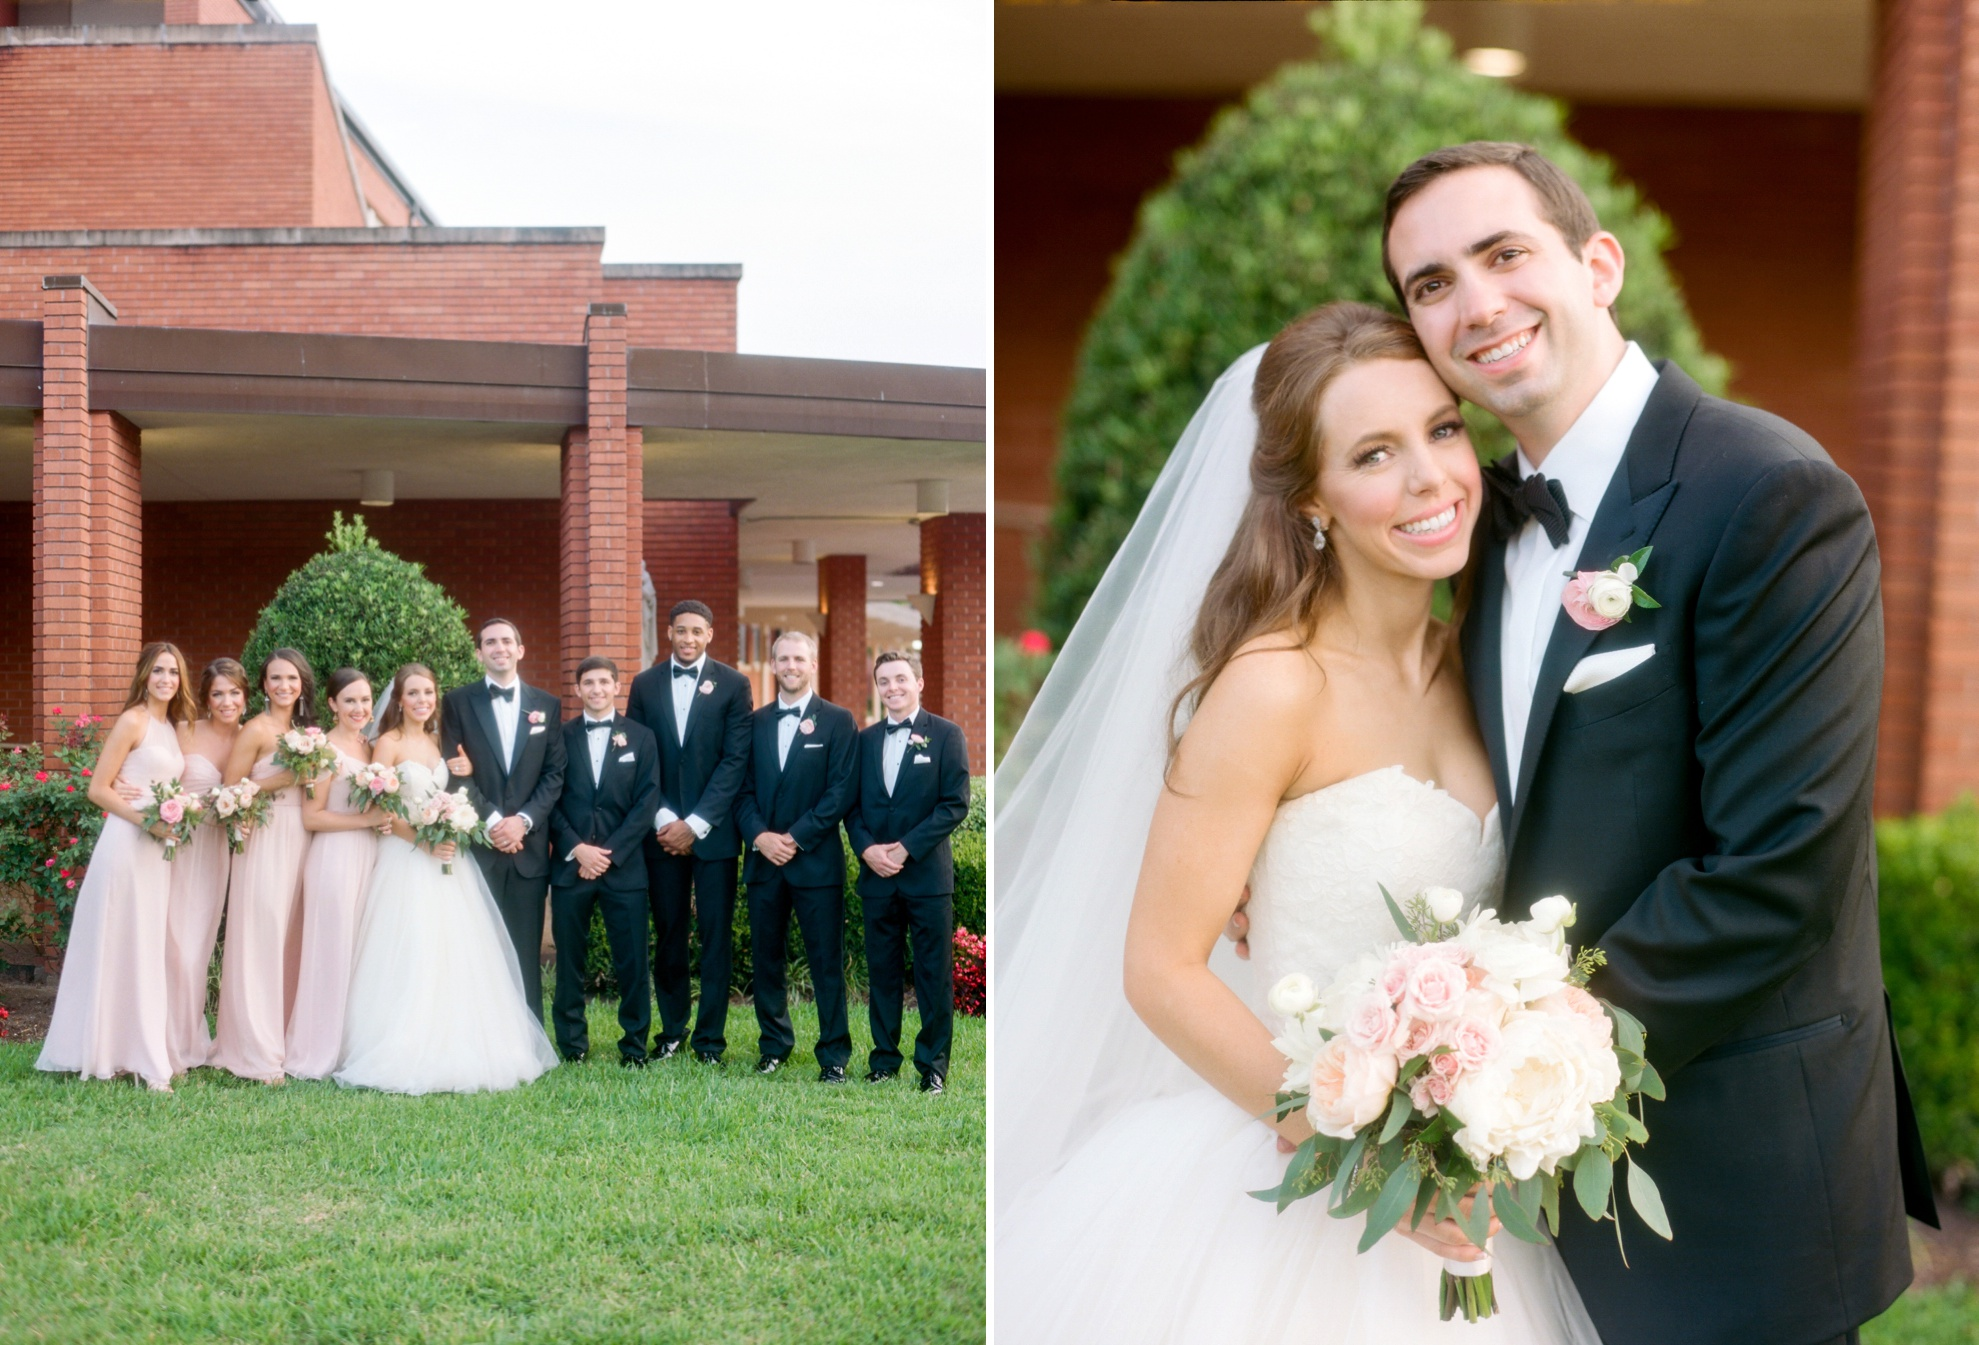 St.-Vincent-De-Paul-Catholic-Church-Wedding-Ceremony-Photographer-Dana-Fernandez-Photography-1.jpg